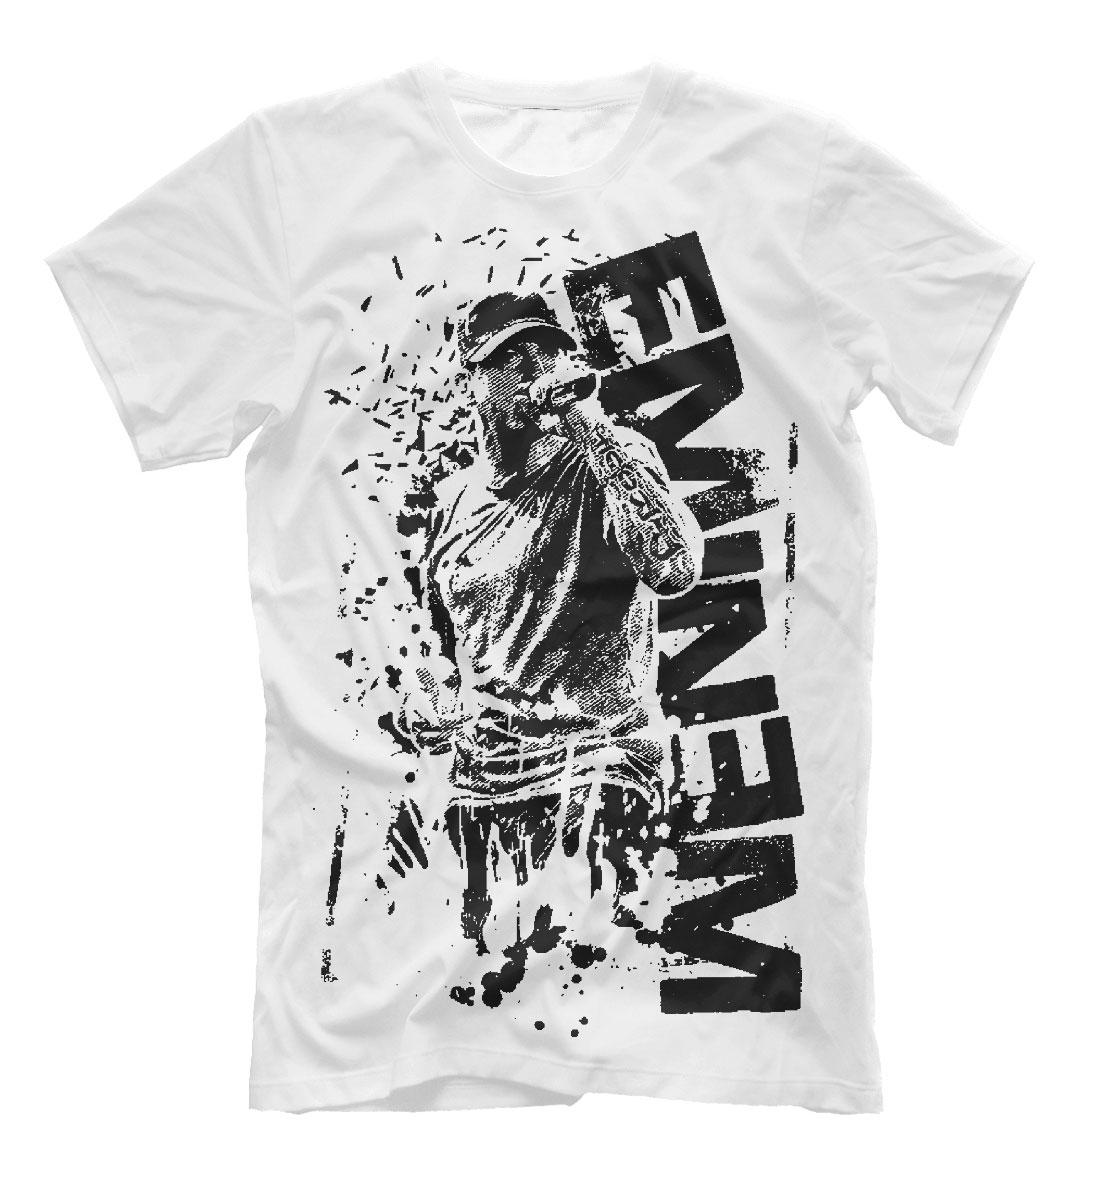 Eminem Printed Men s T-Shirt – Сlothing Store